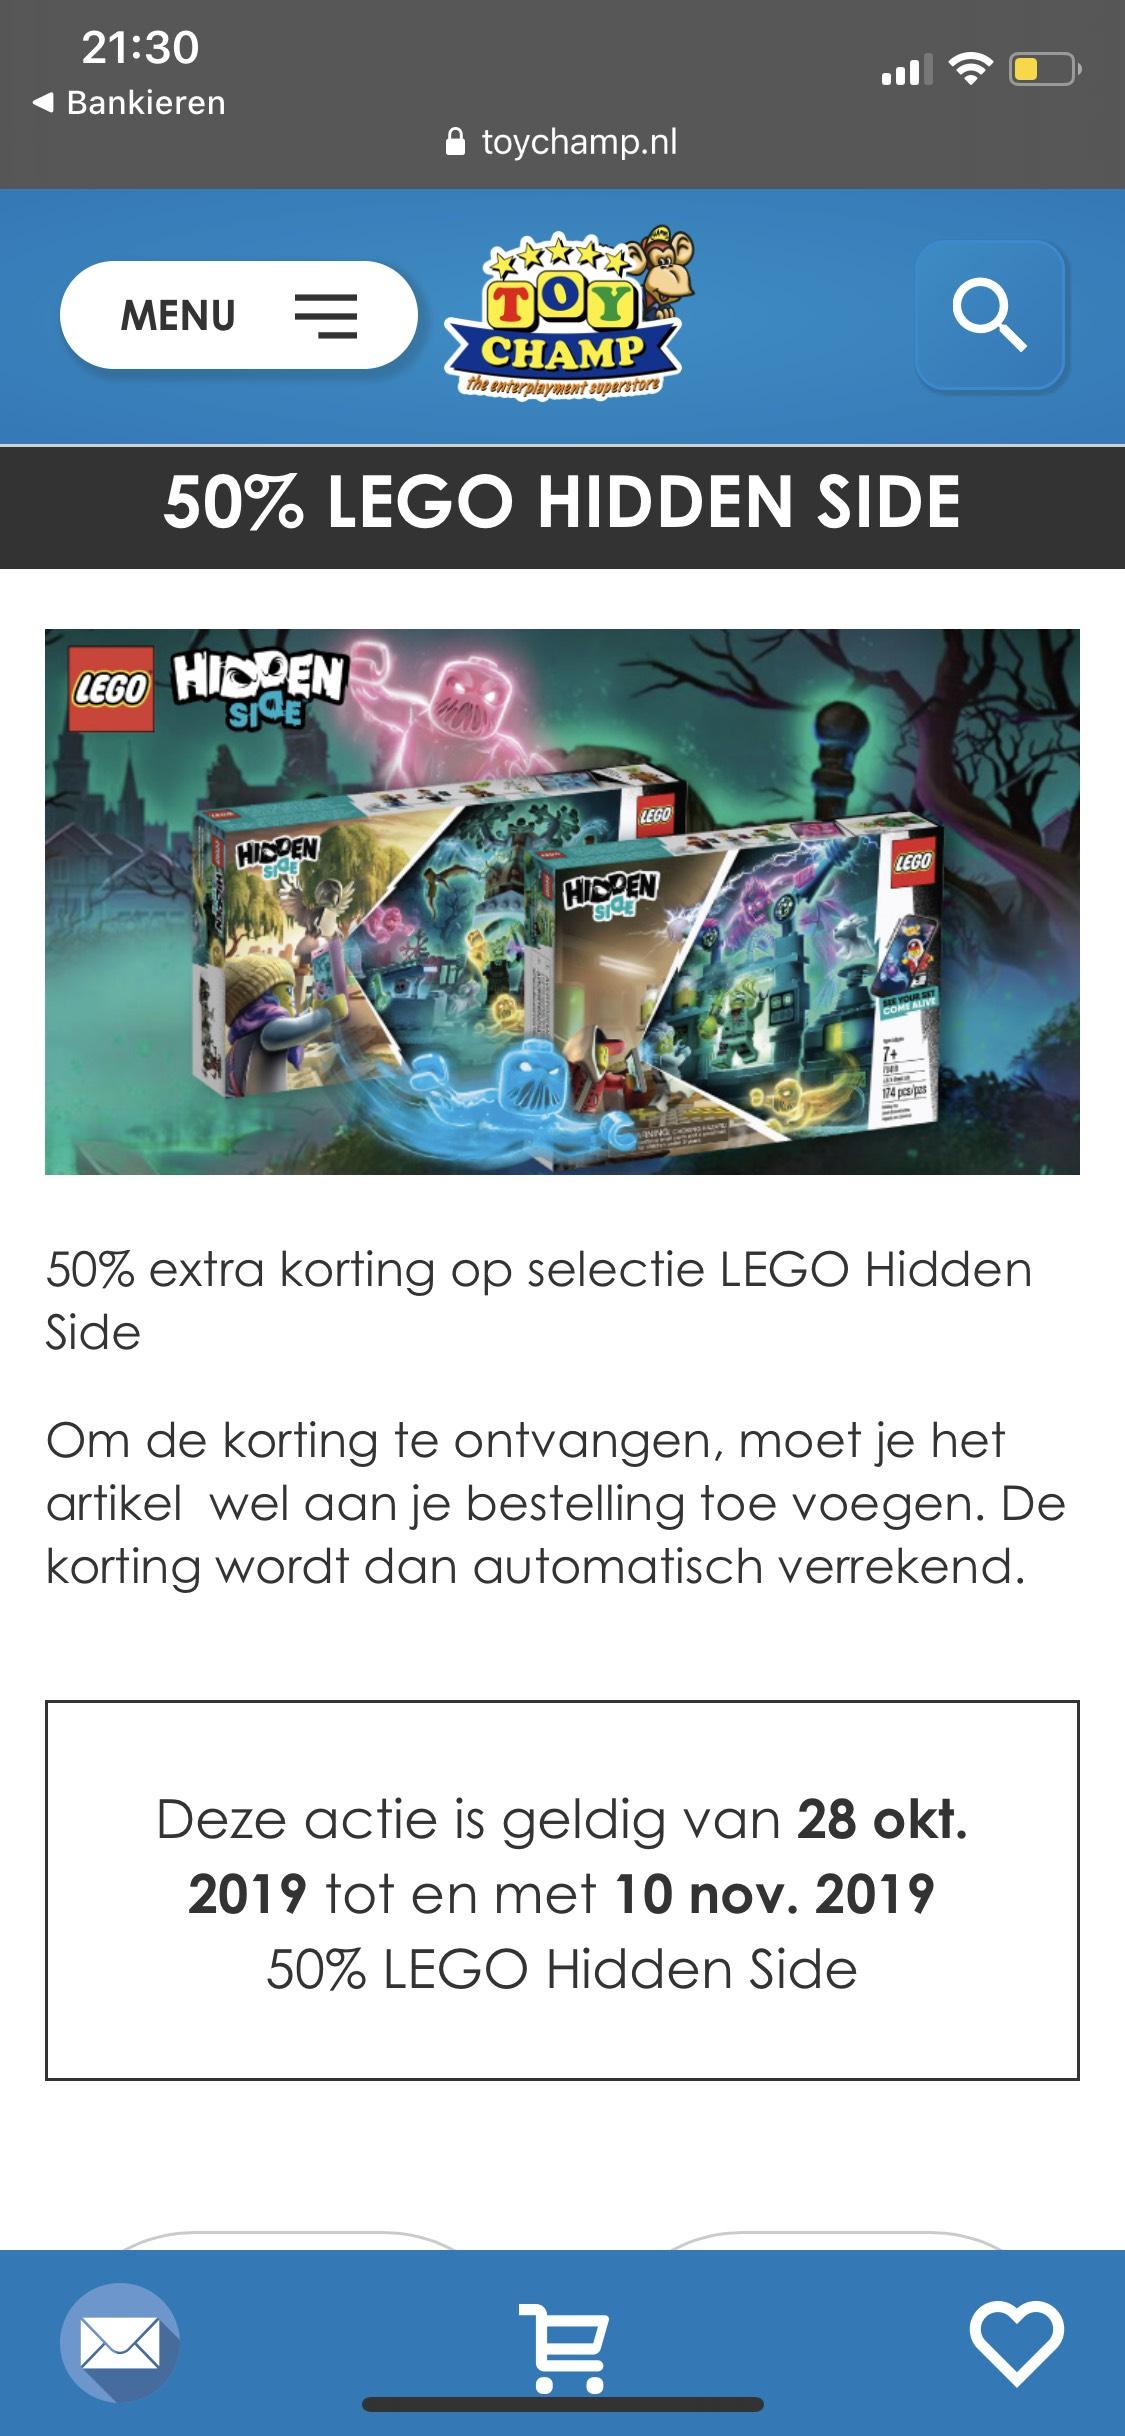 Toychamp 50% korting op LEGO hidden side